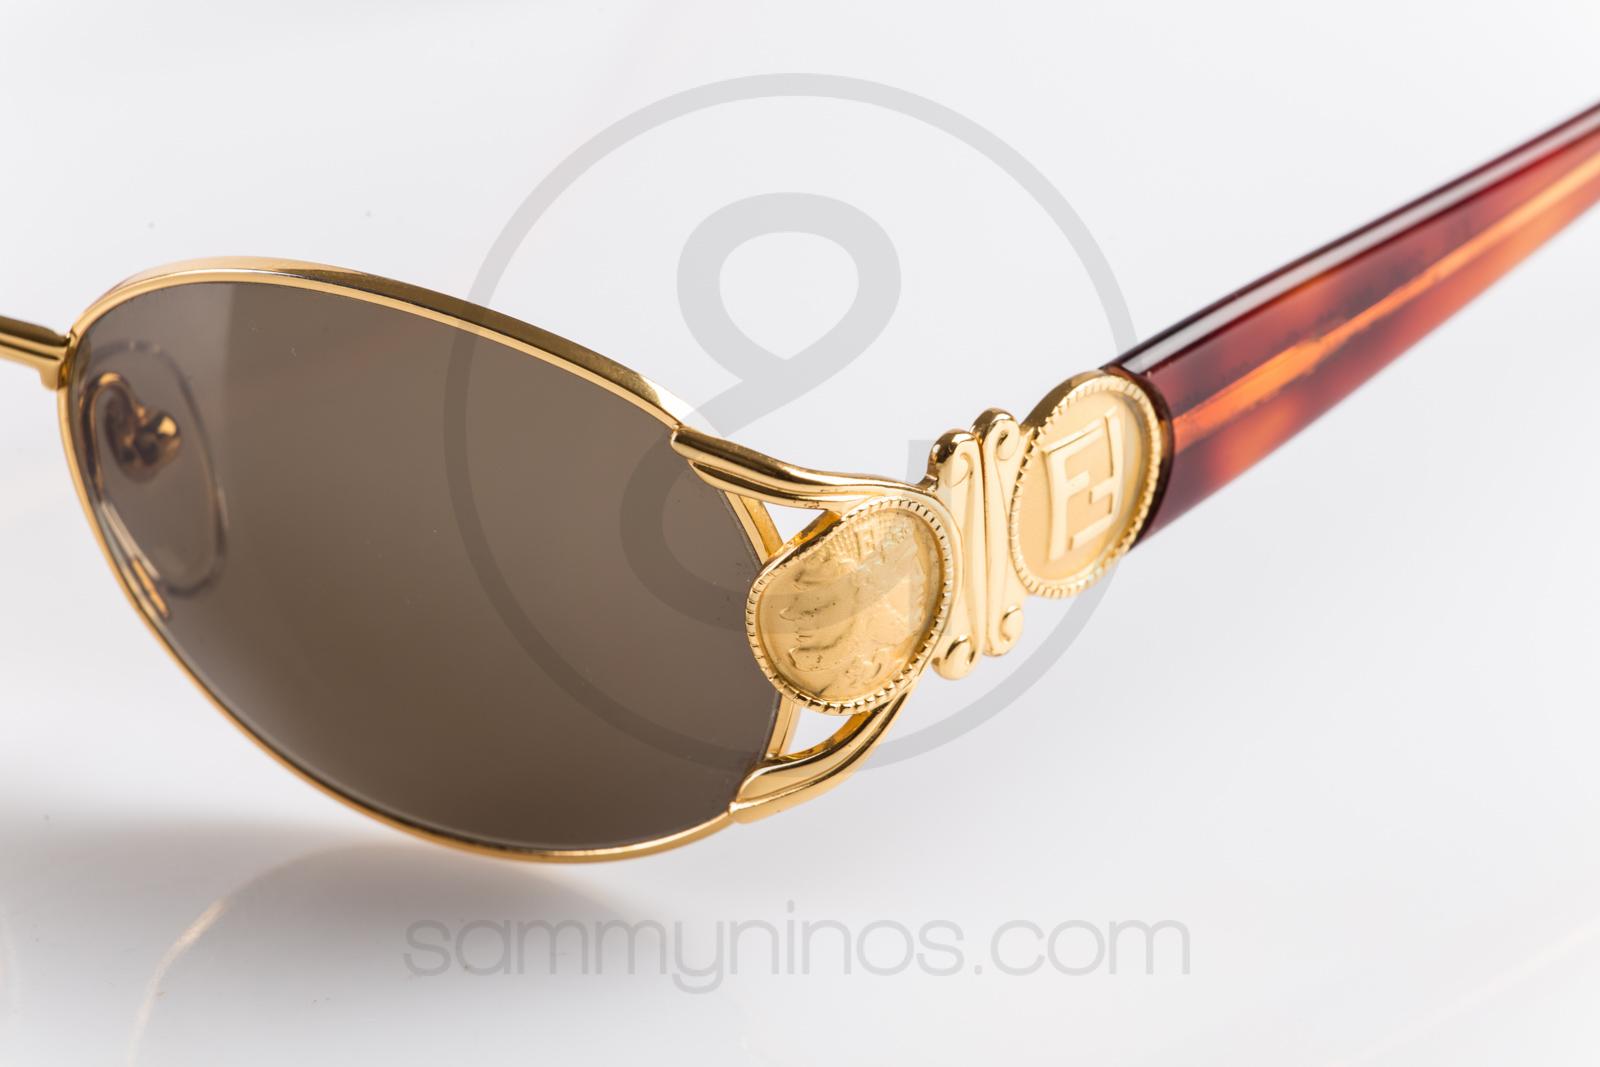 fee5e55dc87 Fendi Aviator Sunglasses Gold « One More Soul